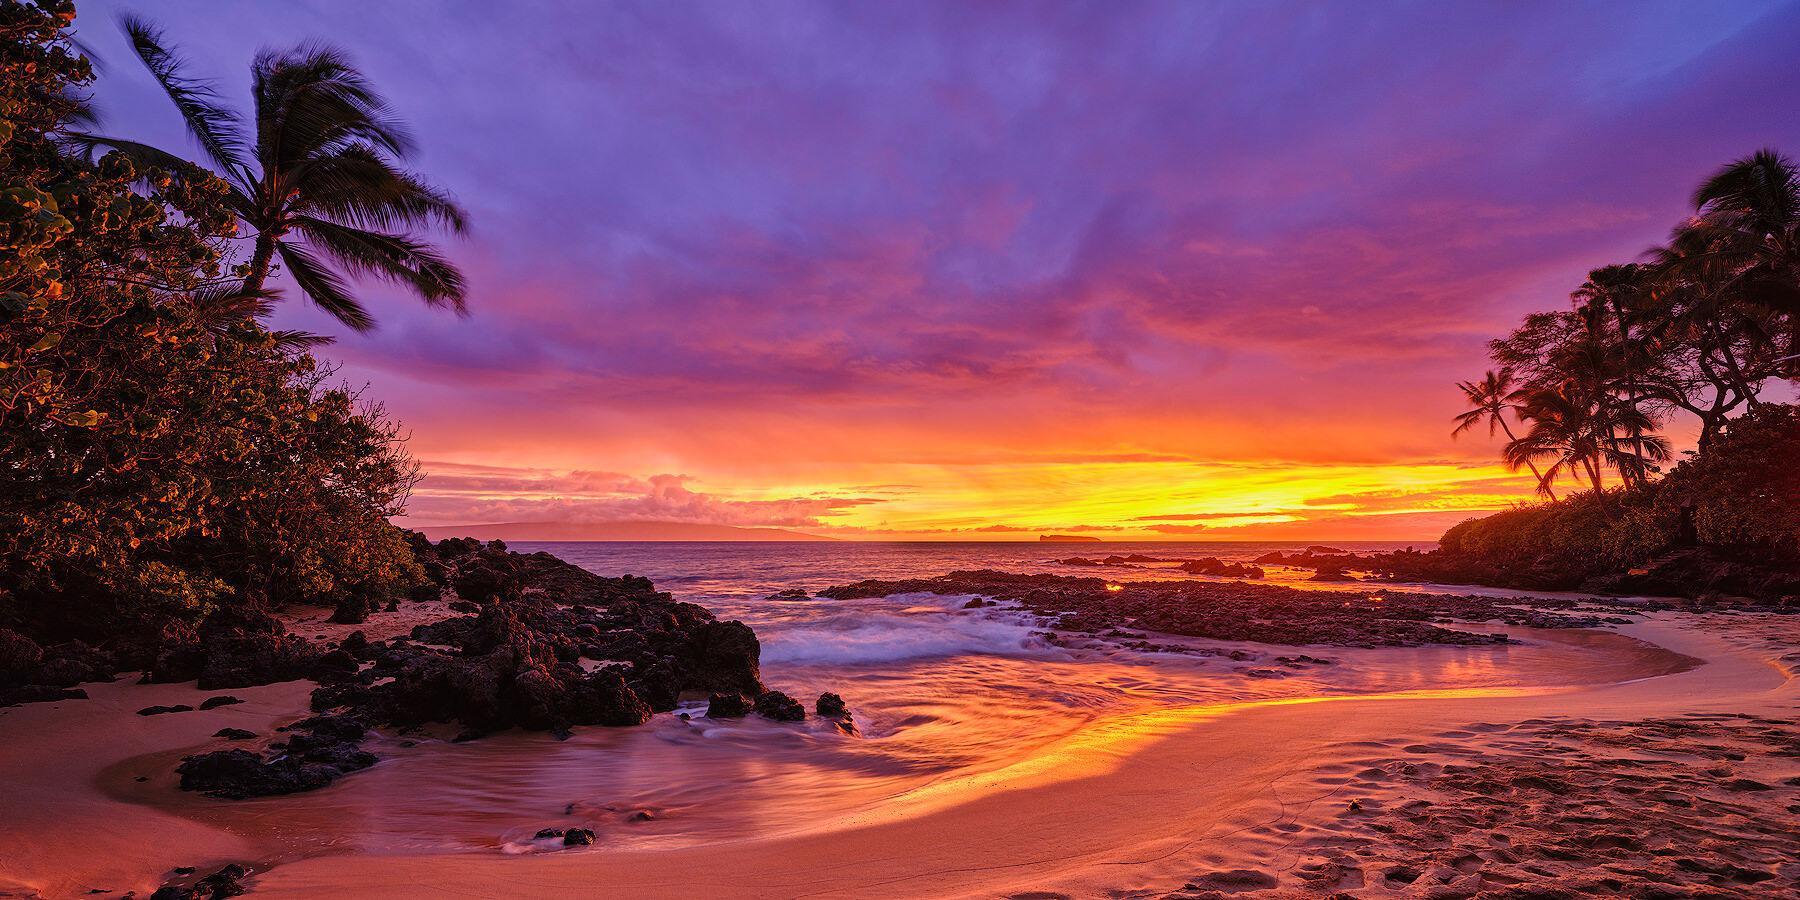 purple, pink, secret beach, sunset, makena, wailea, hurricane, secret cove, wedding beach, photo